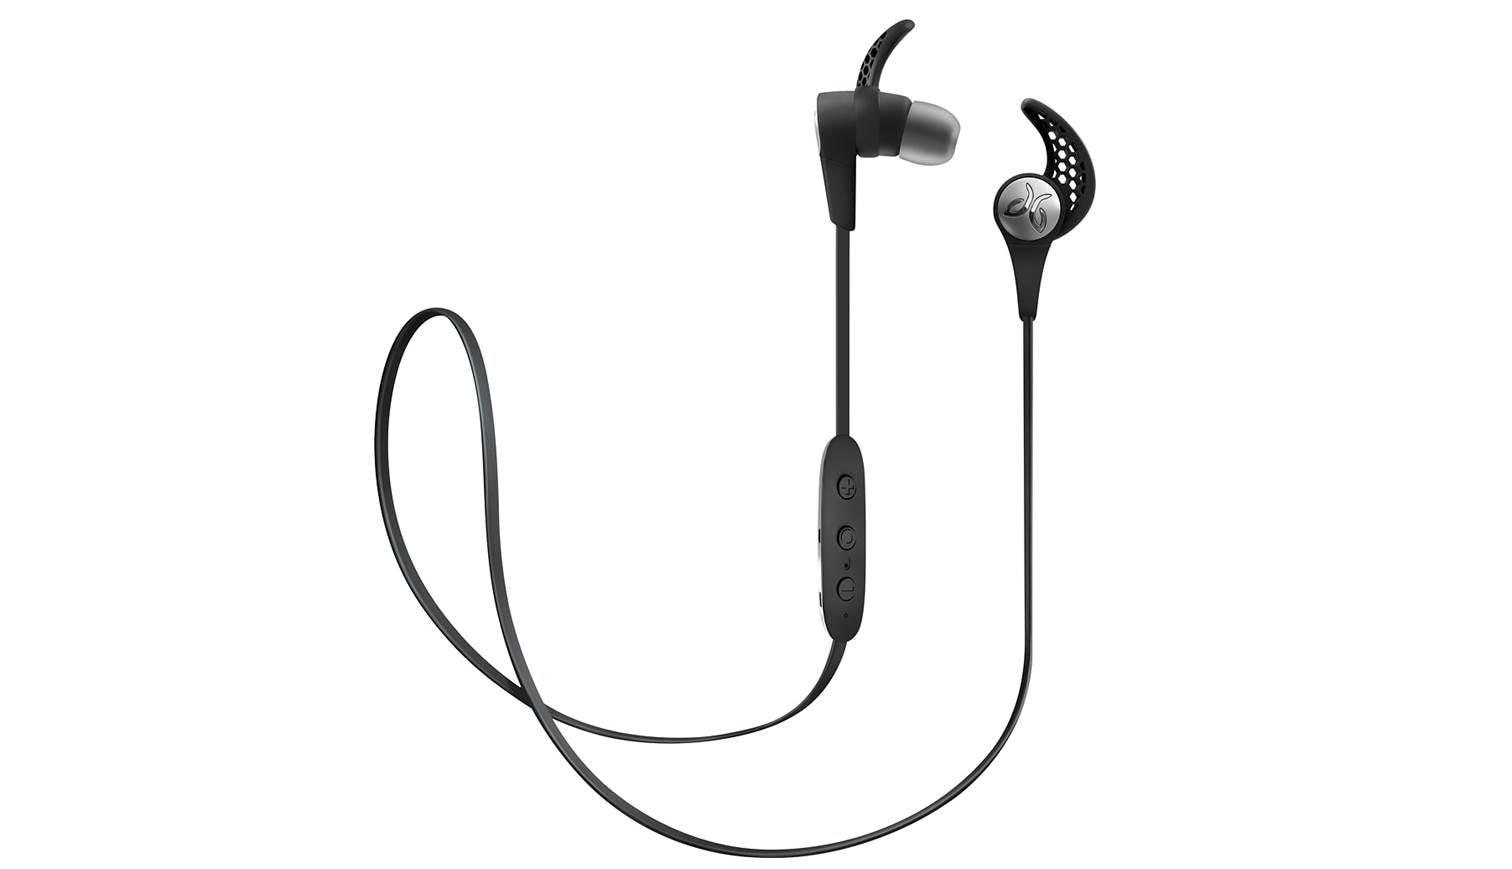 jaybird x3 wireless in ear headphone black harvey norman singapore. Black Bedroom Furniture Sets. Home Design Ideas